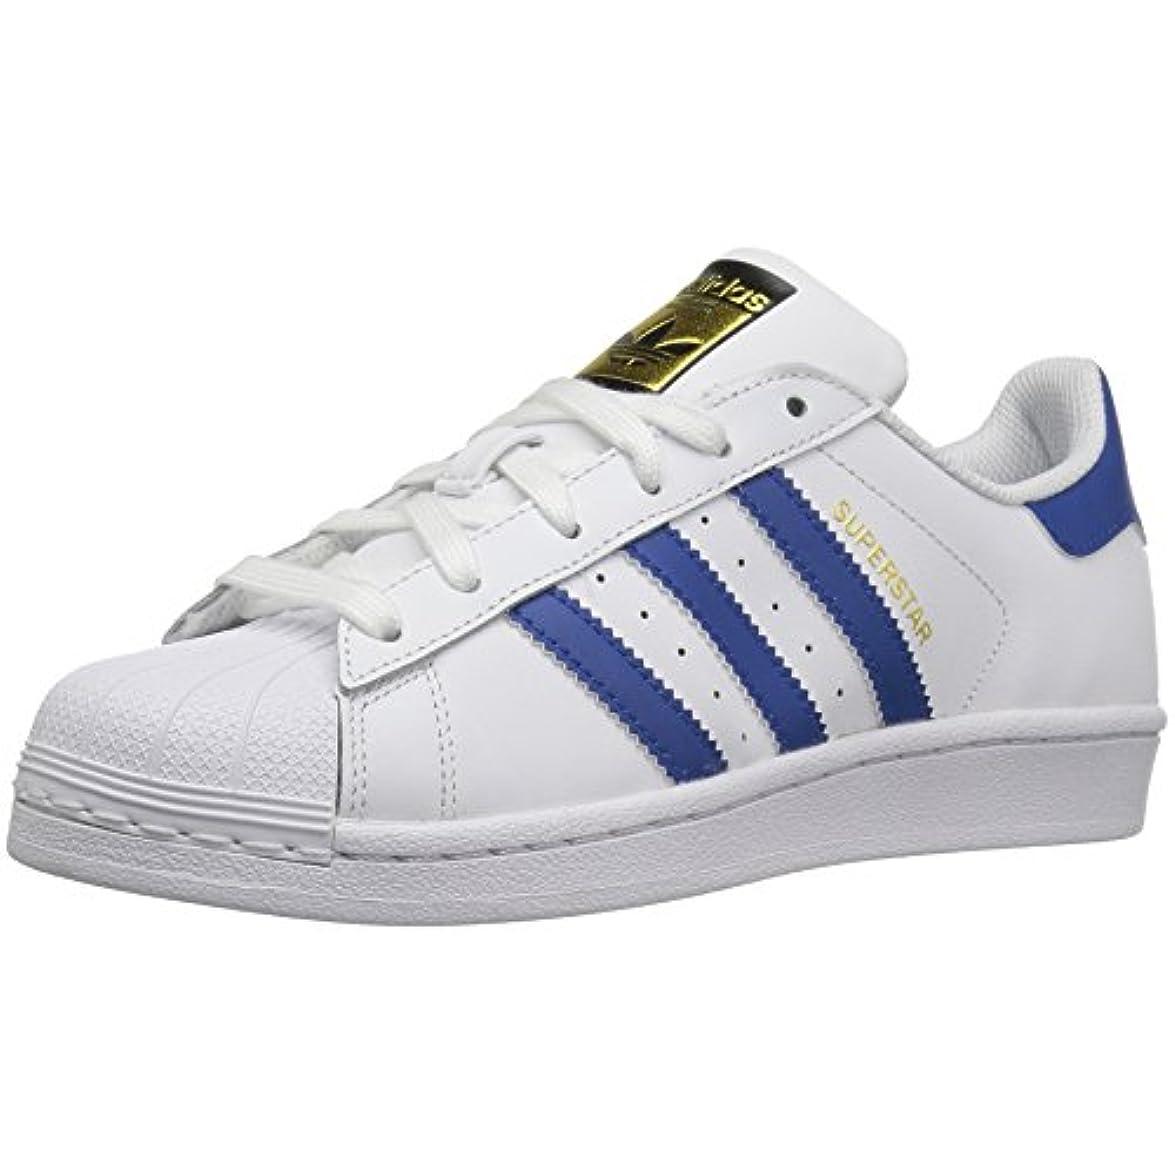 Adidas Superstar Foundation Scarpe Basse Bambino